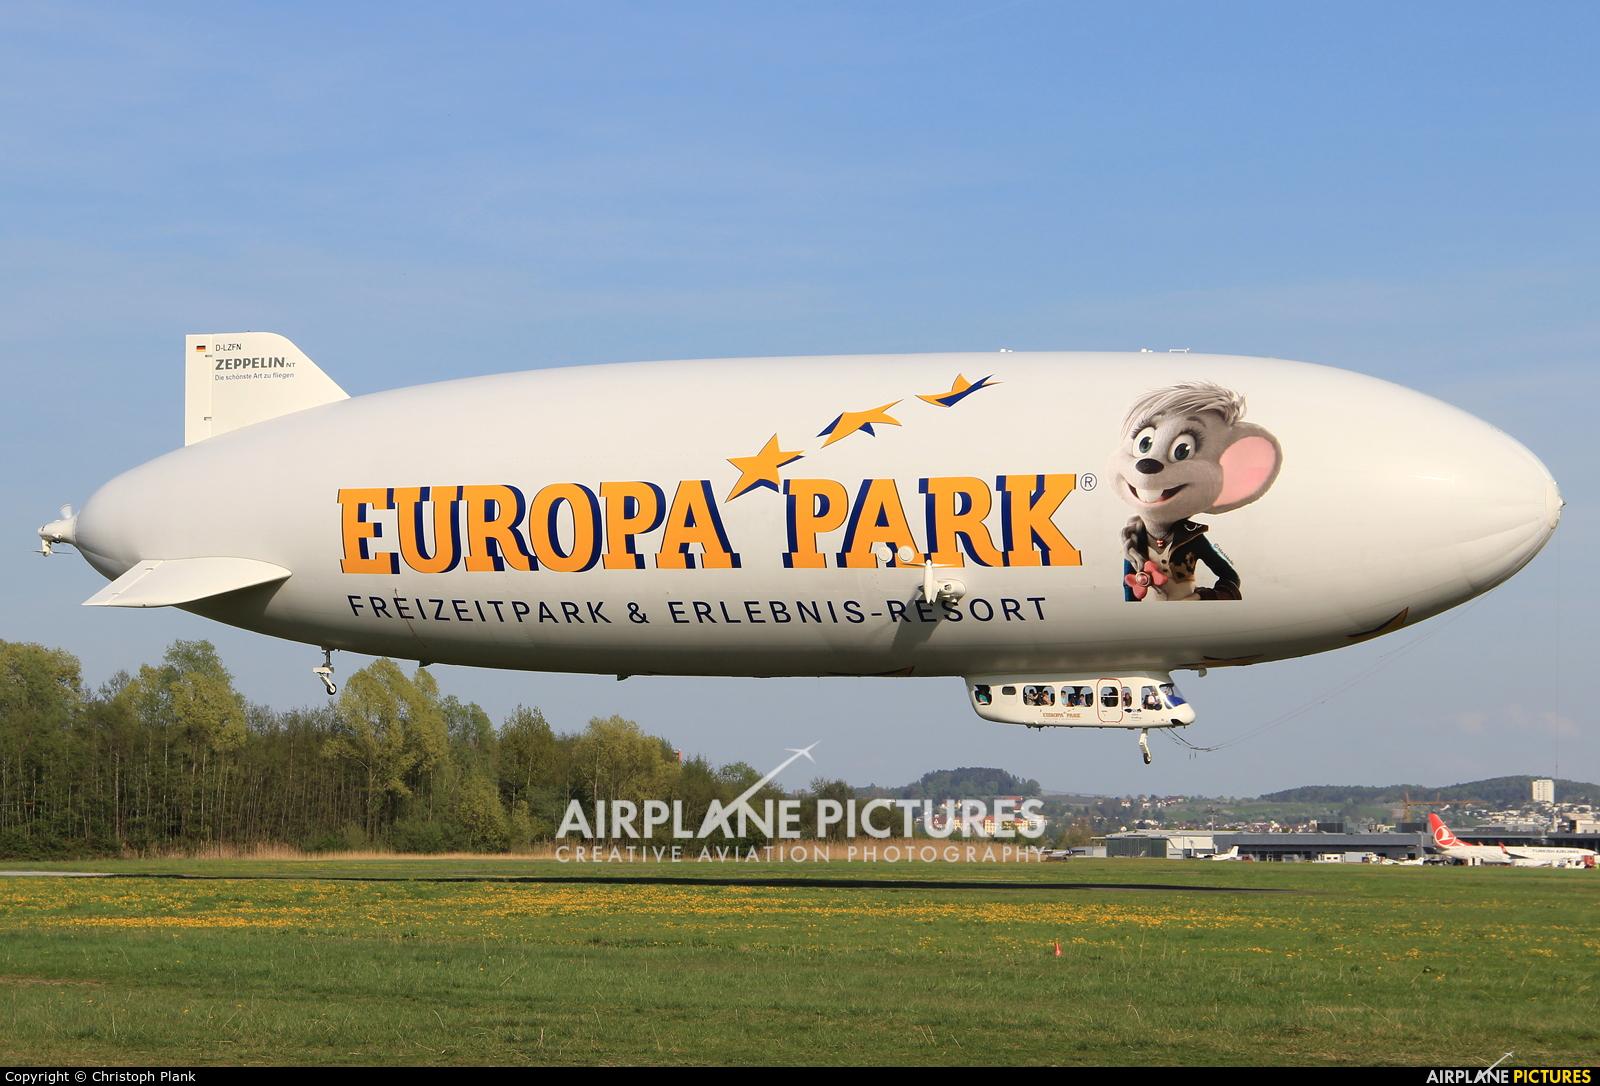 Zeppelin D-LZFN aircraft at Friedrichshafen